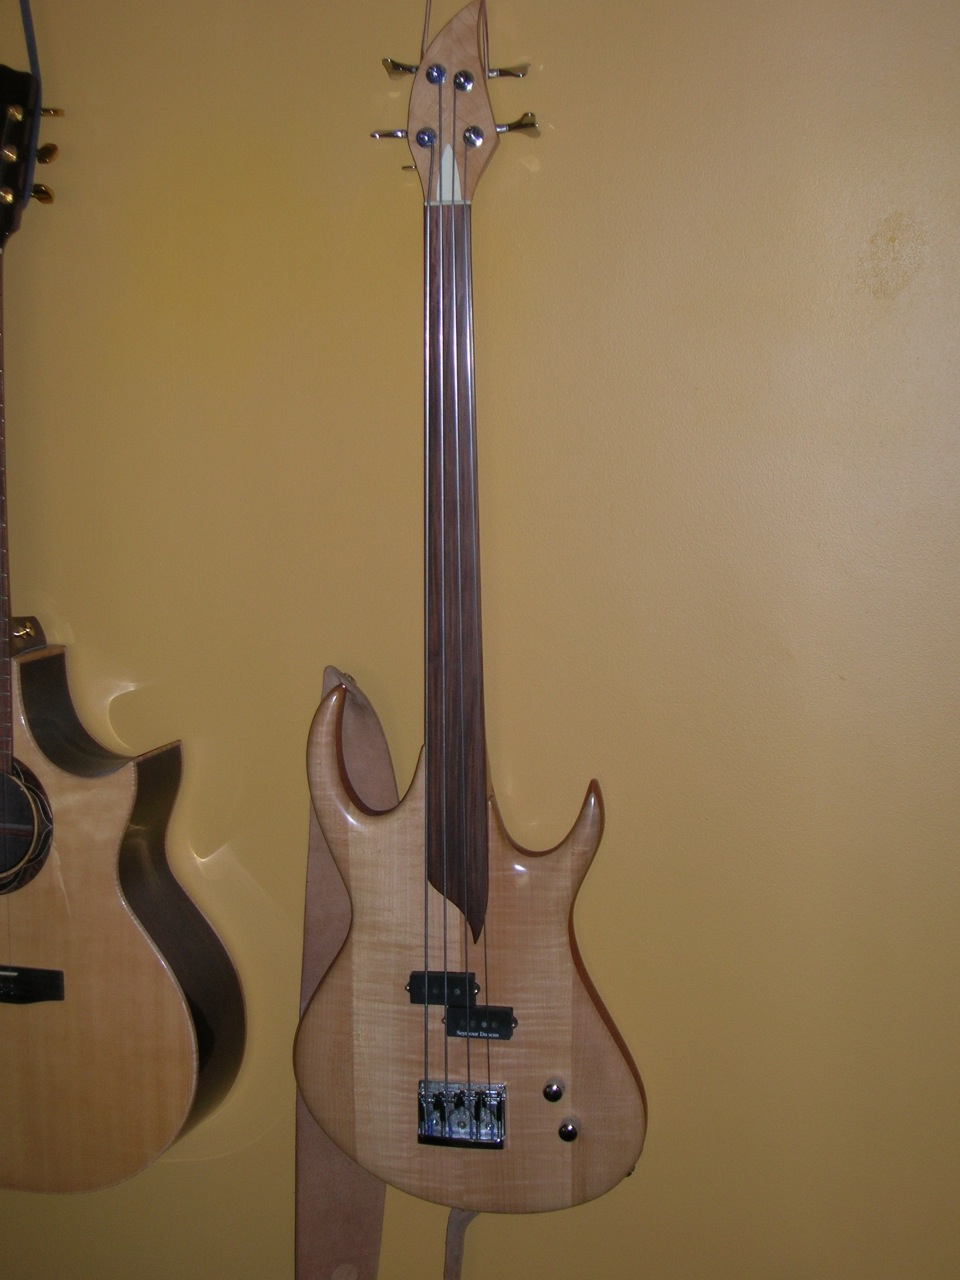 Fretless Bass in Curley Maple, Mahogany and Pau Ferro